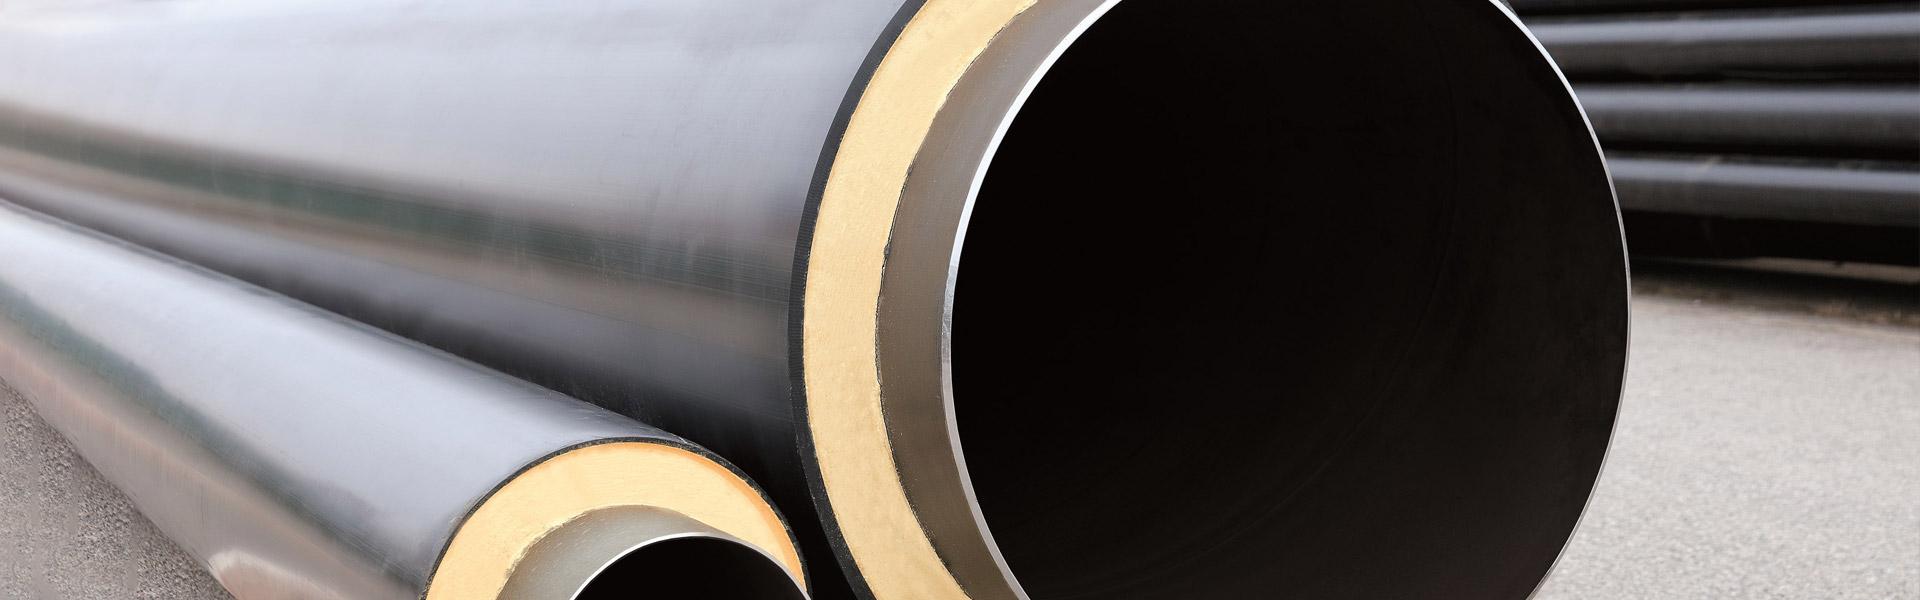 3PE防腐鋼管與環氧煤瀝青防腐鋼管的區別在哪里?